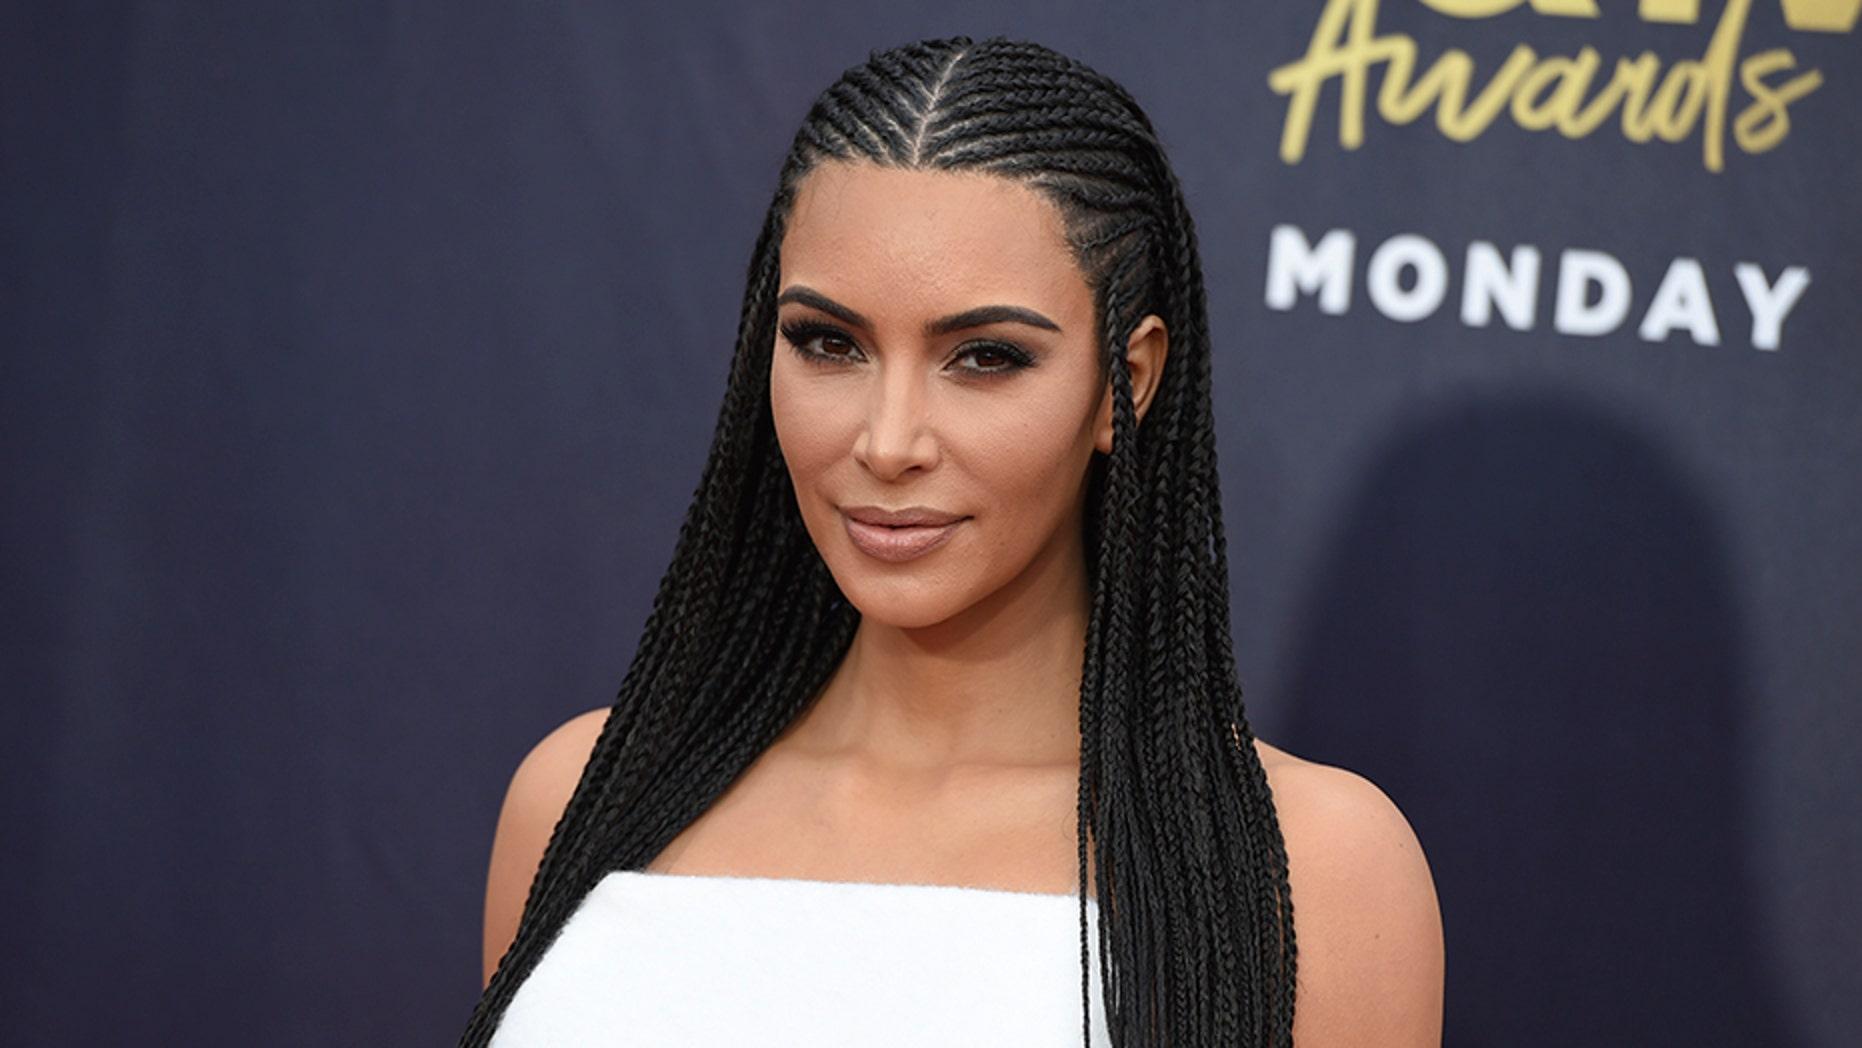 Kim Kardashian S Braids Called Out As Cultural Appropriation Fox